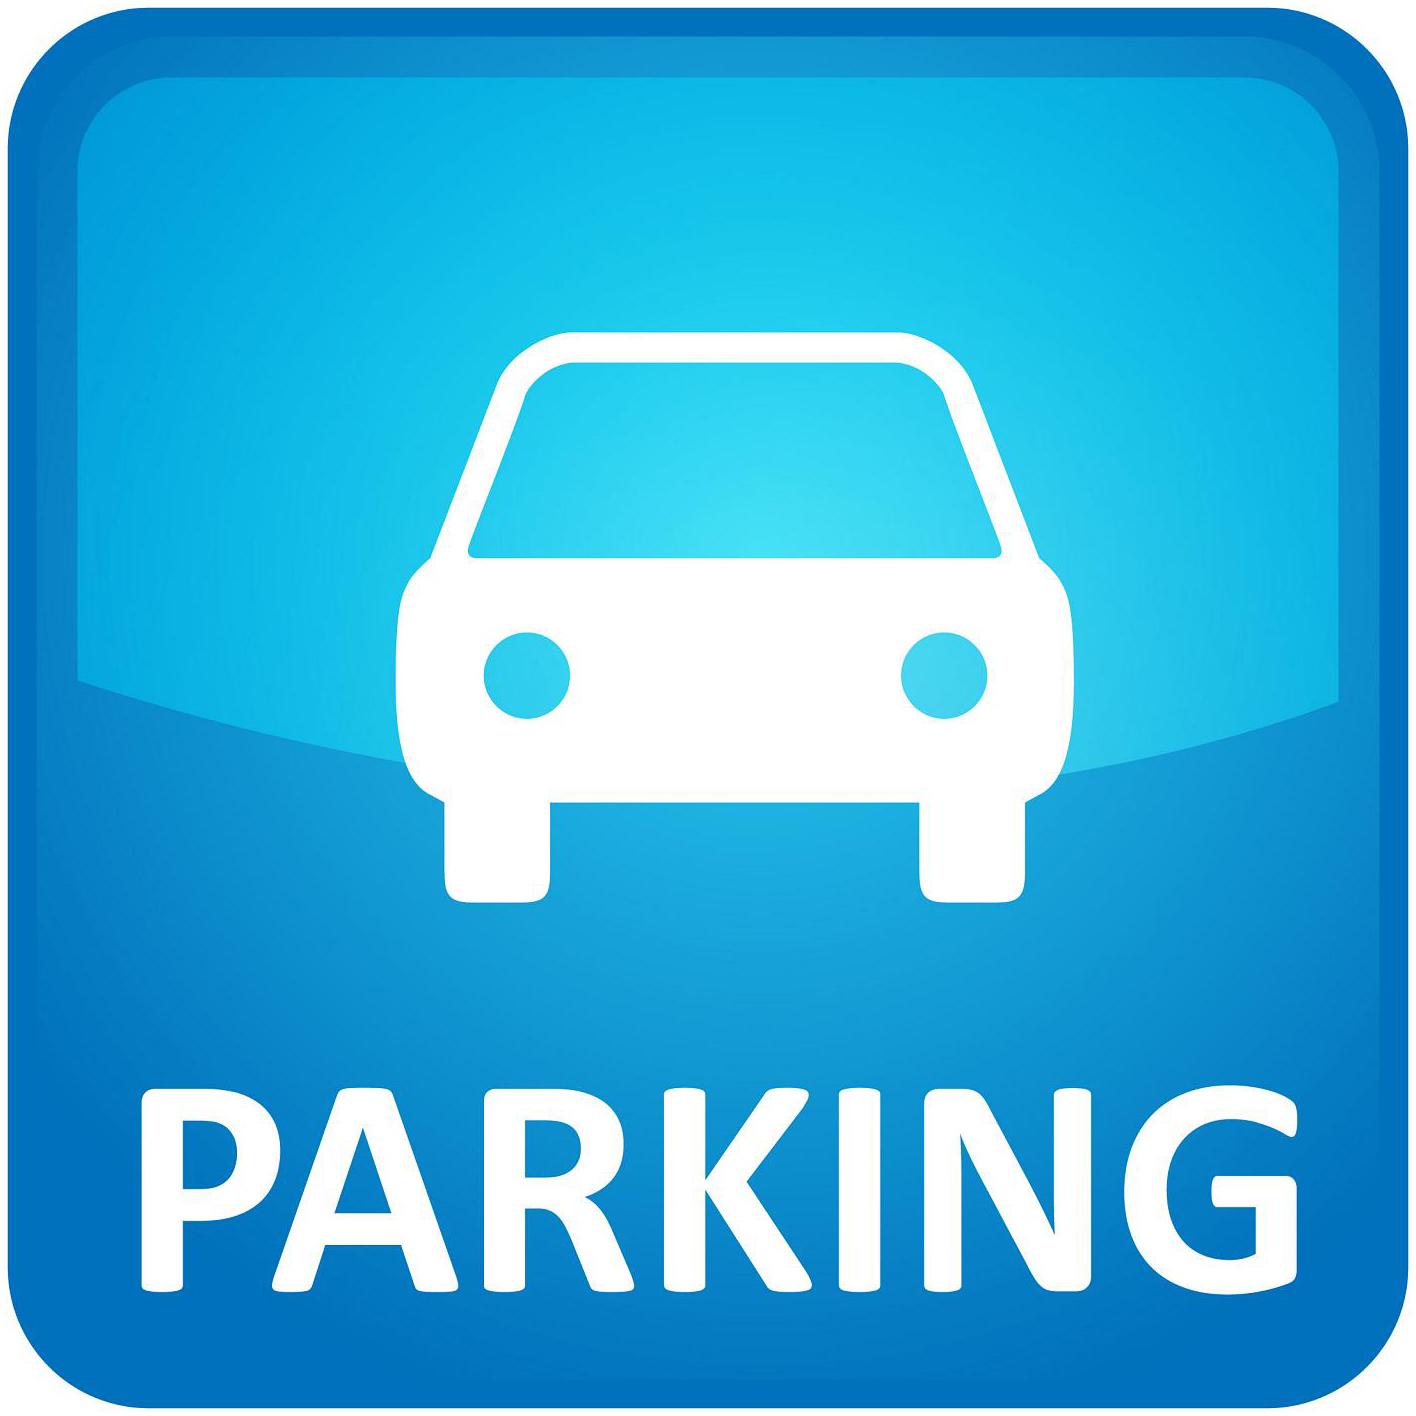 carparkingsign2